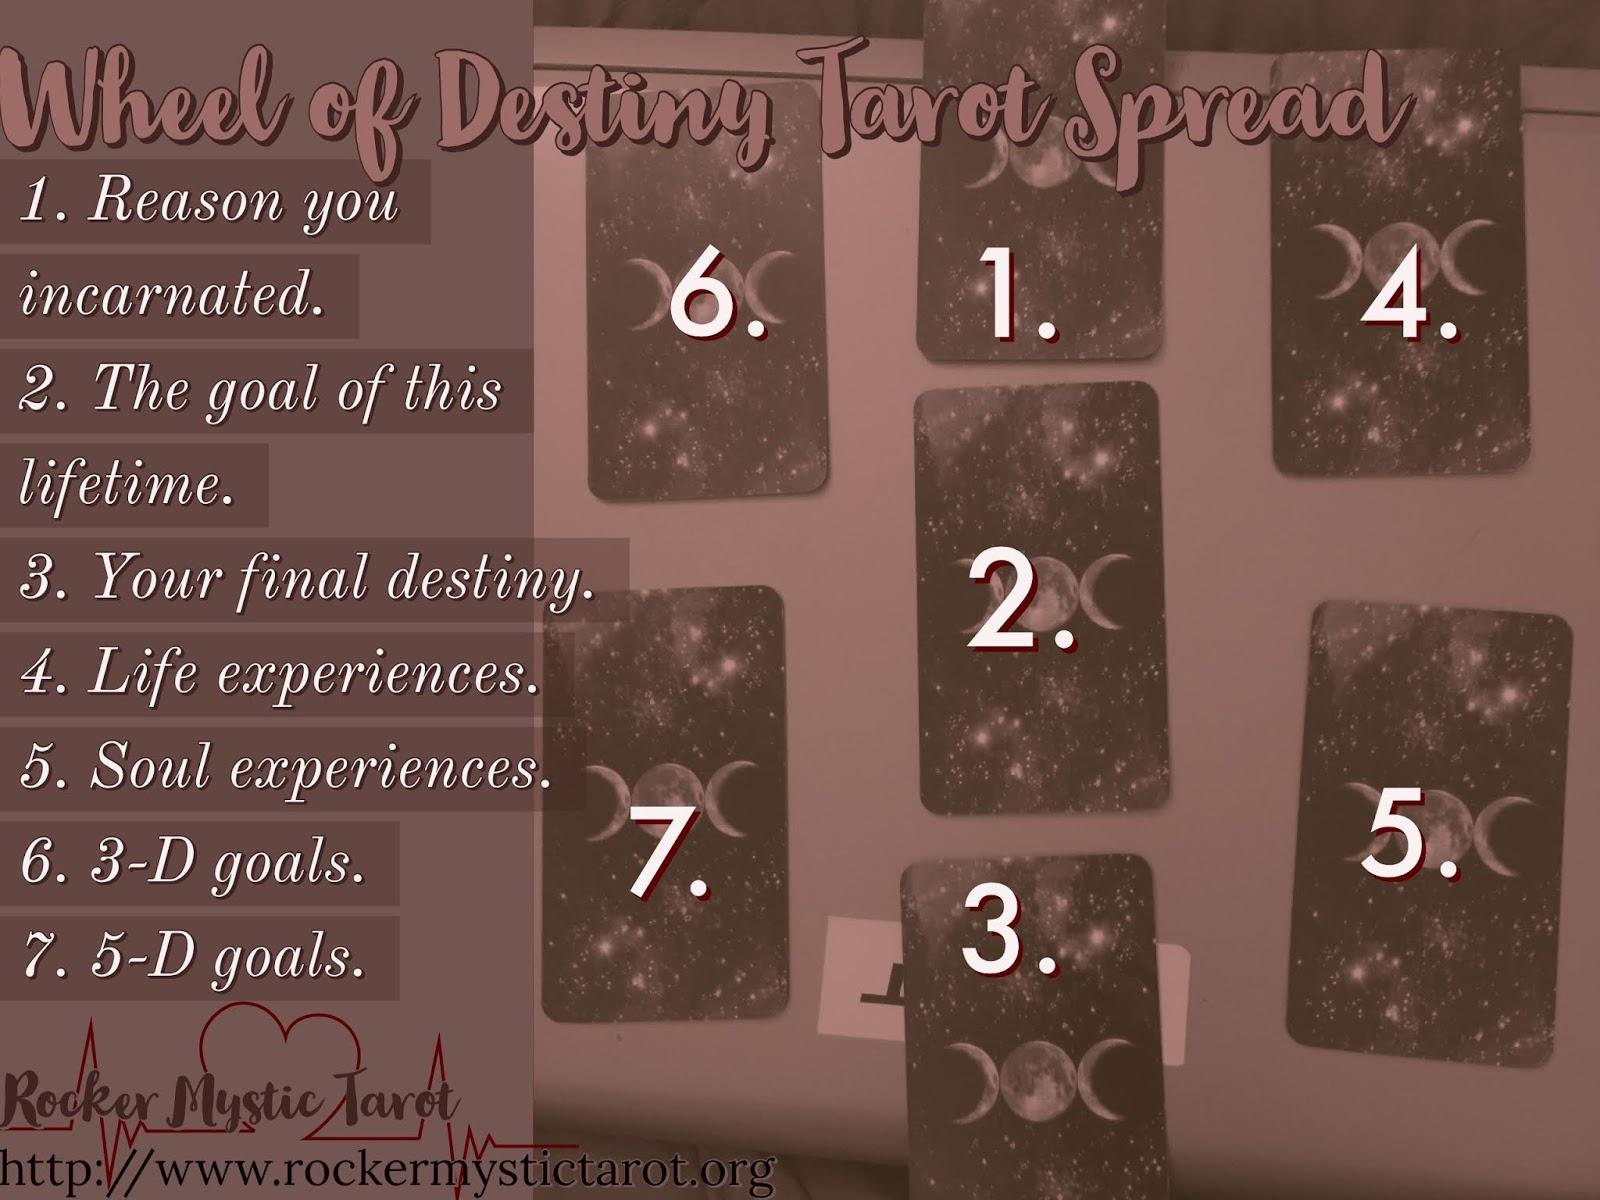 Wheel of Destiny - Tarot Spread